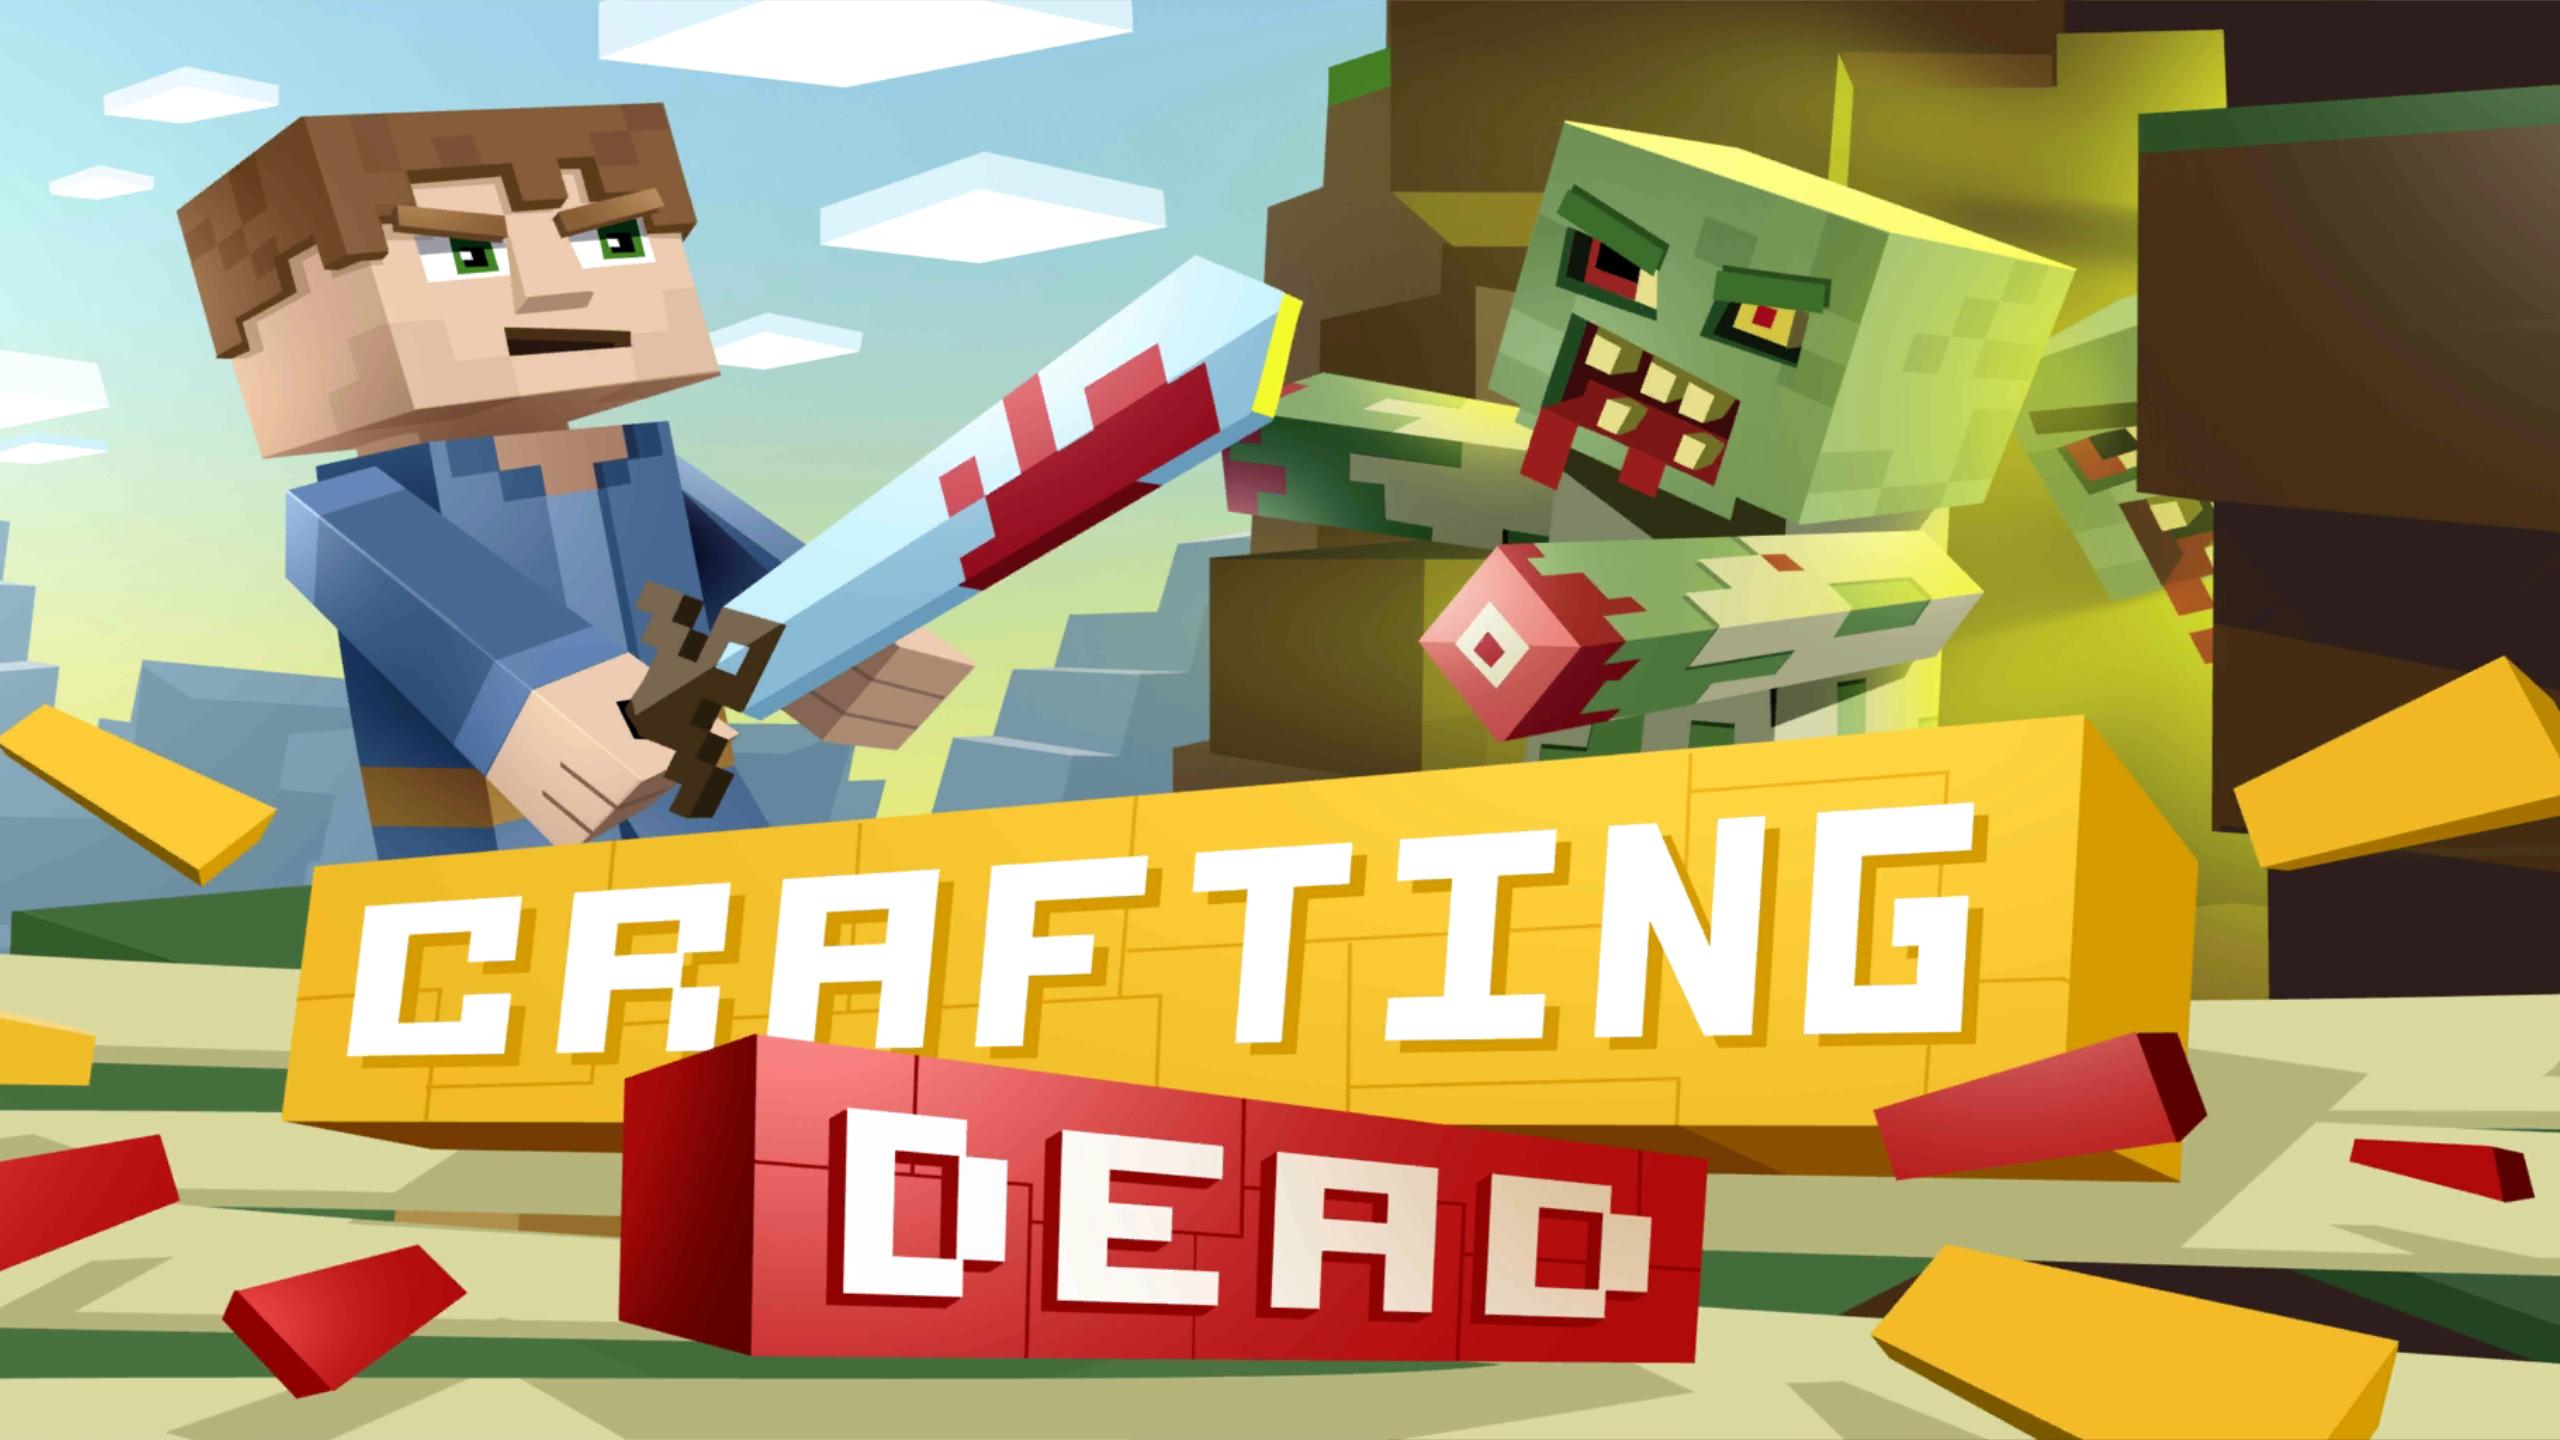 Crafting dead v 0 beta file mod db for Crafting dead mod download